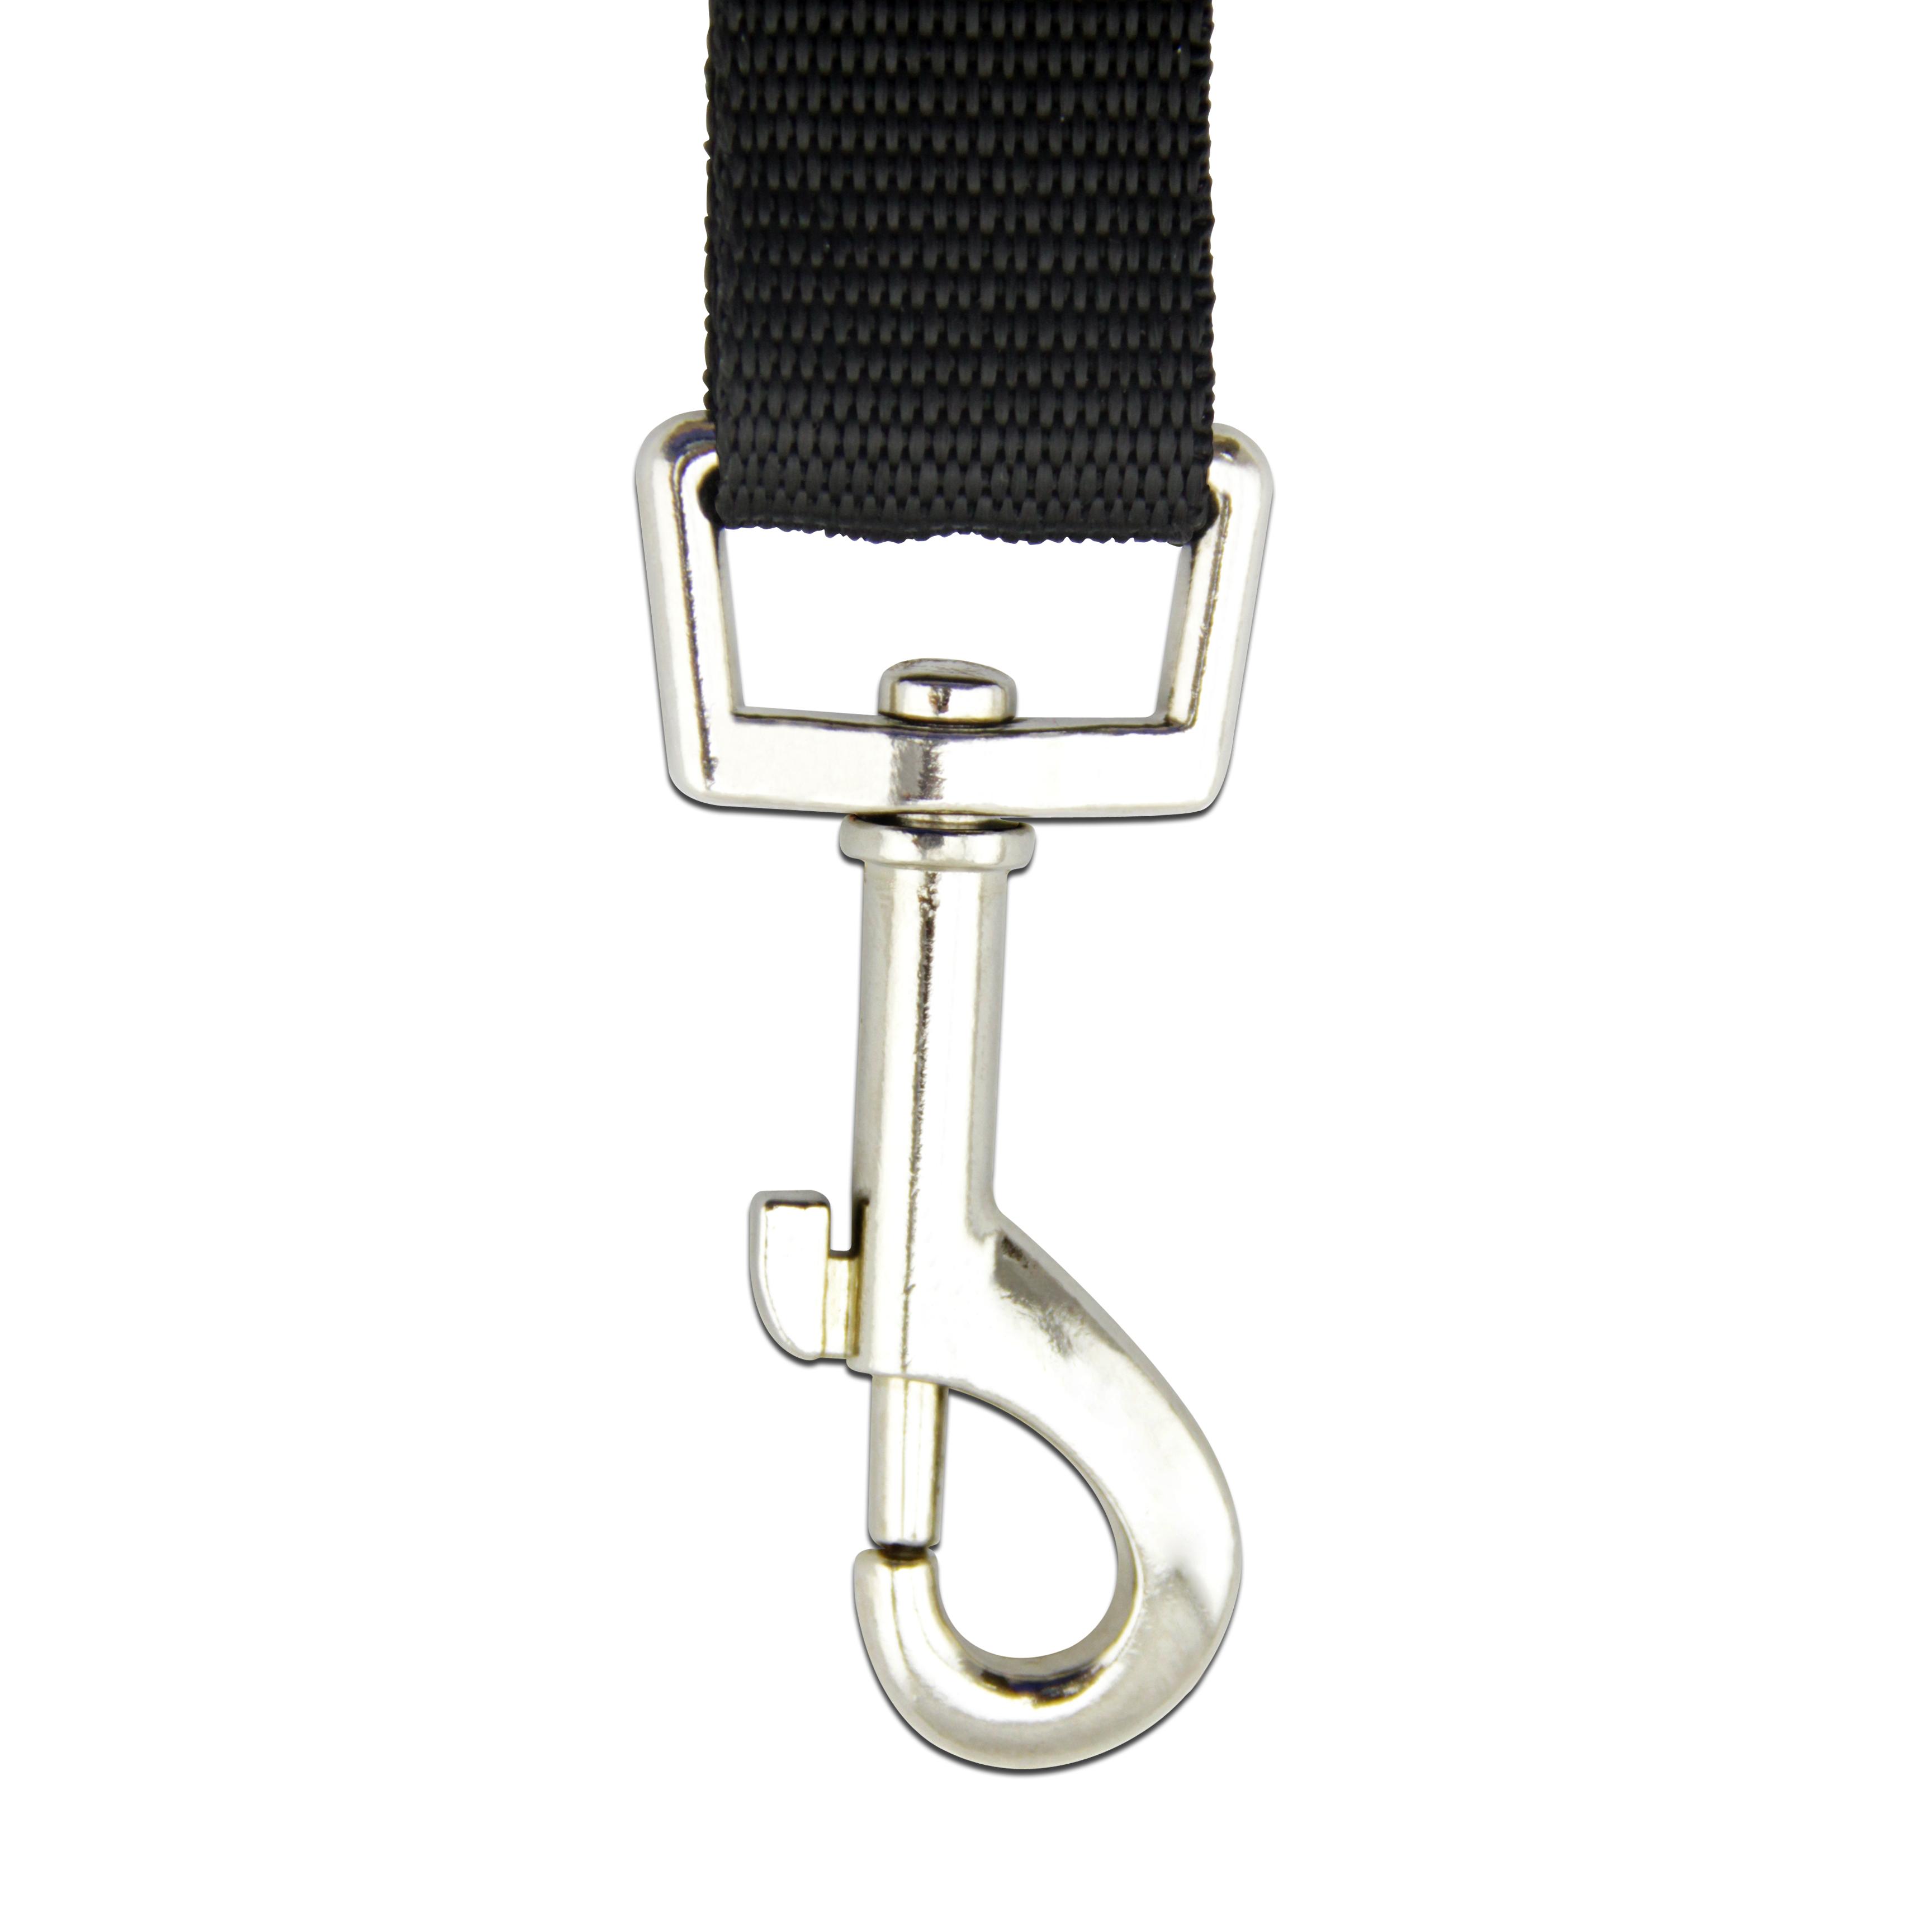 2x cat dog pet safety seatbelt for car vehicle seat belt